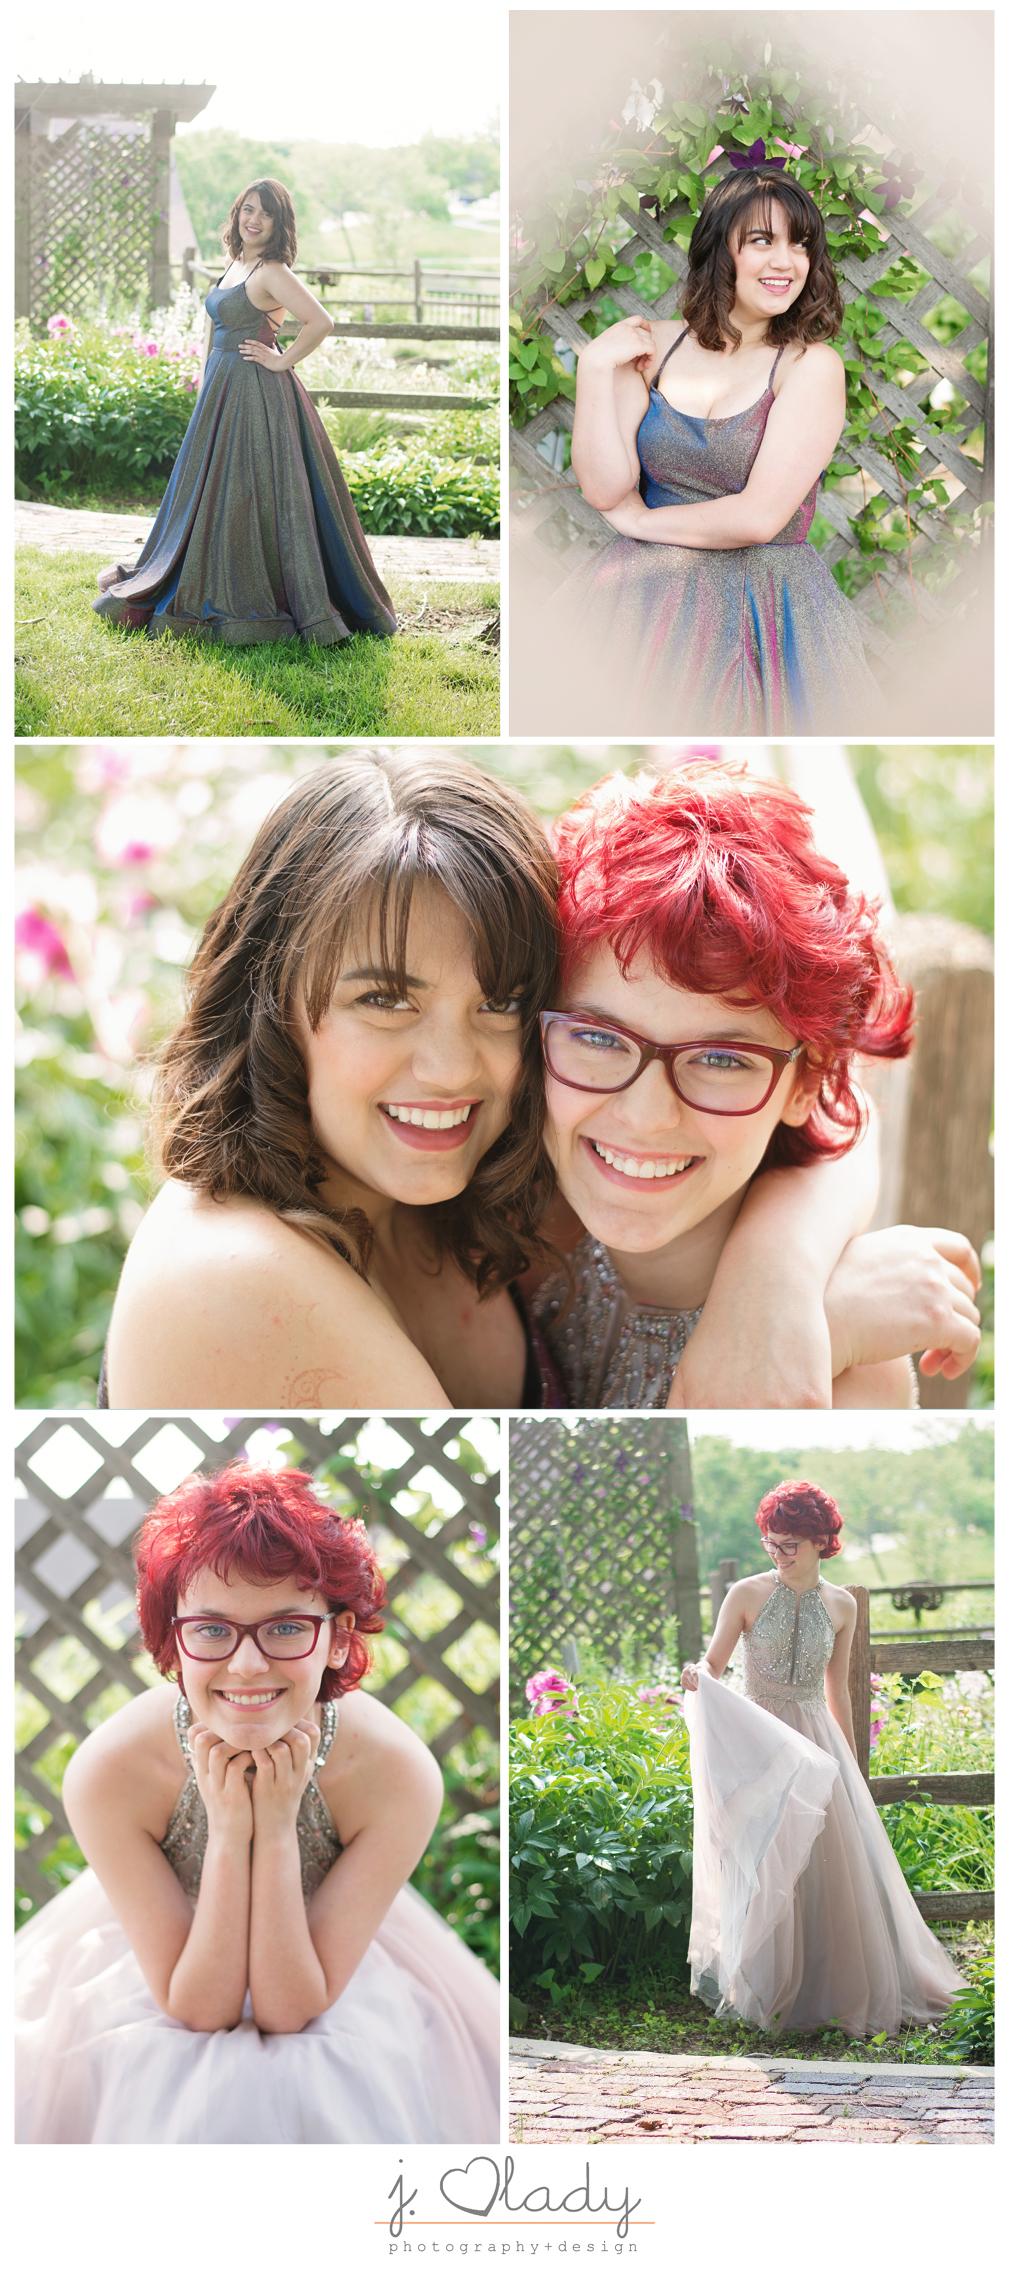 Shelby + Peyton by J Lovelady Photography Kansas City Photographer www.jlovelady.com